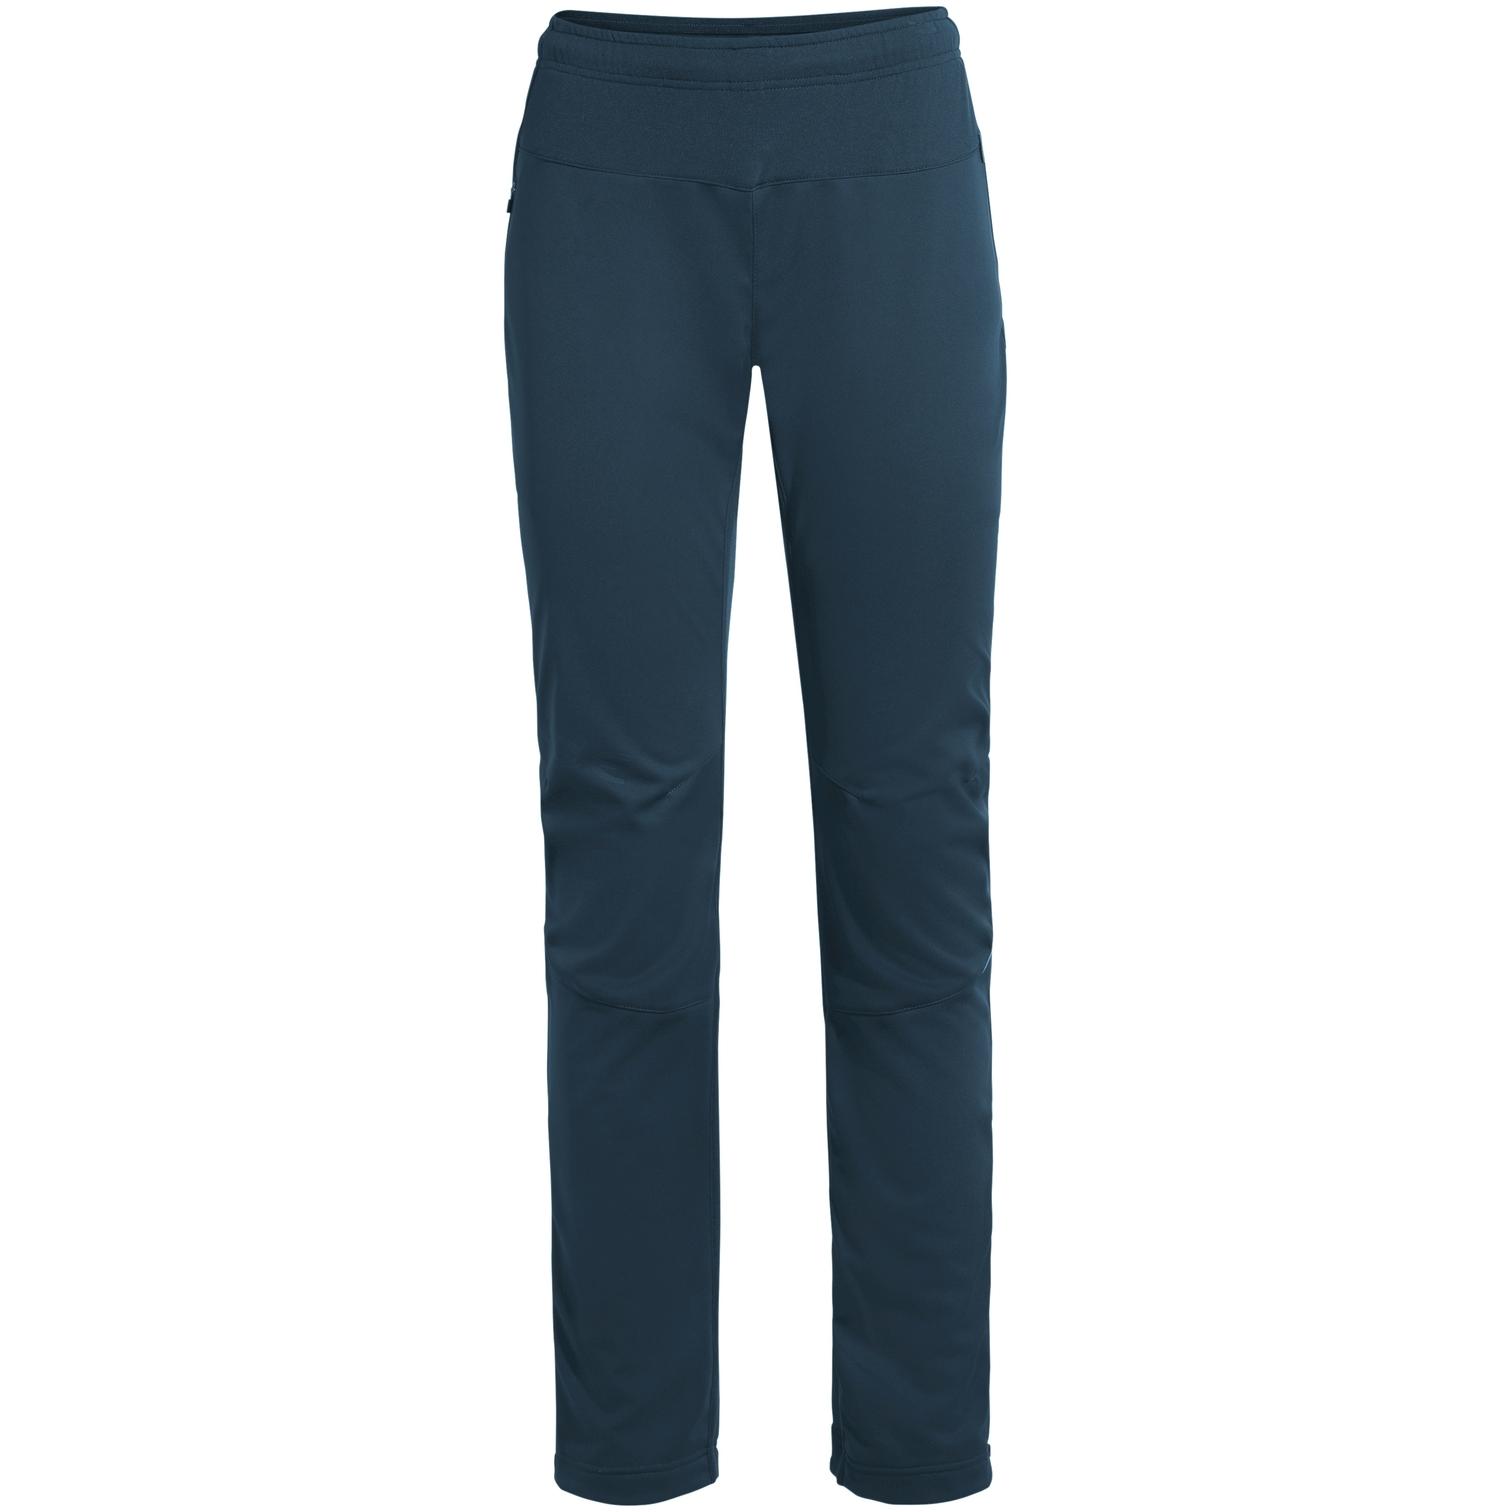 Vaude Women's Wintry Pants IV - dark sea